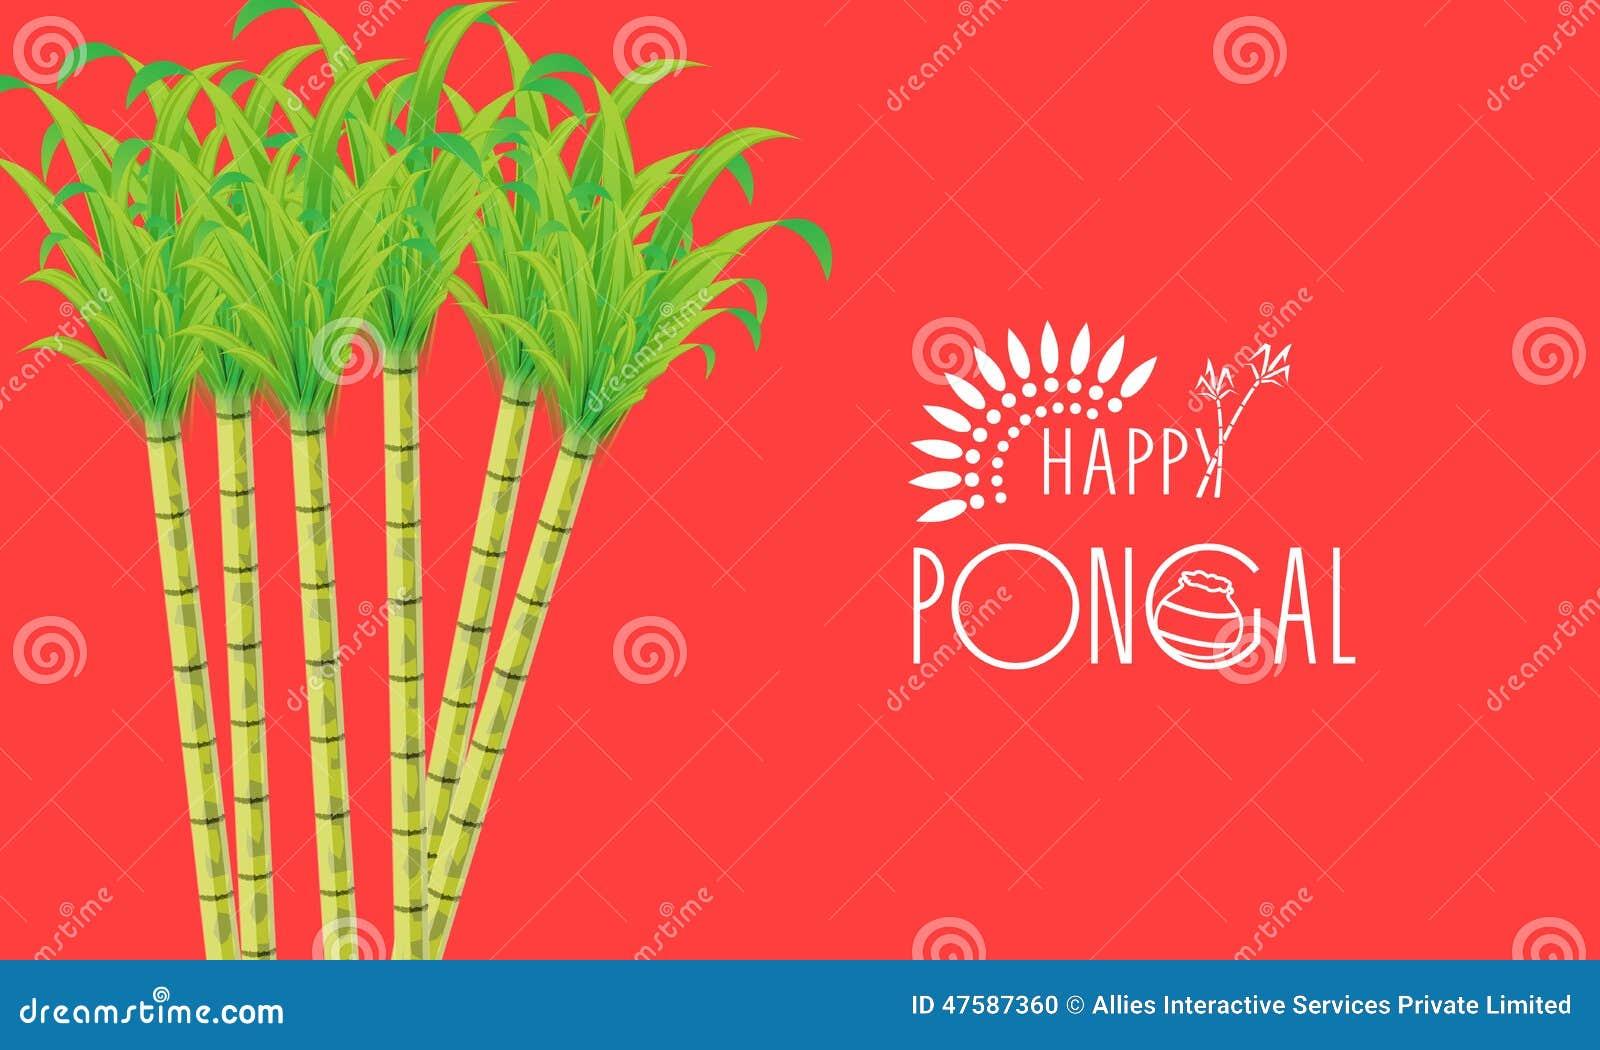 Poster Or Banner Design For Happy Pongal Festival